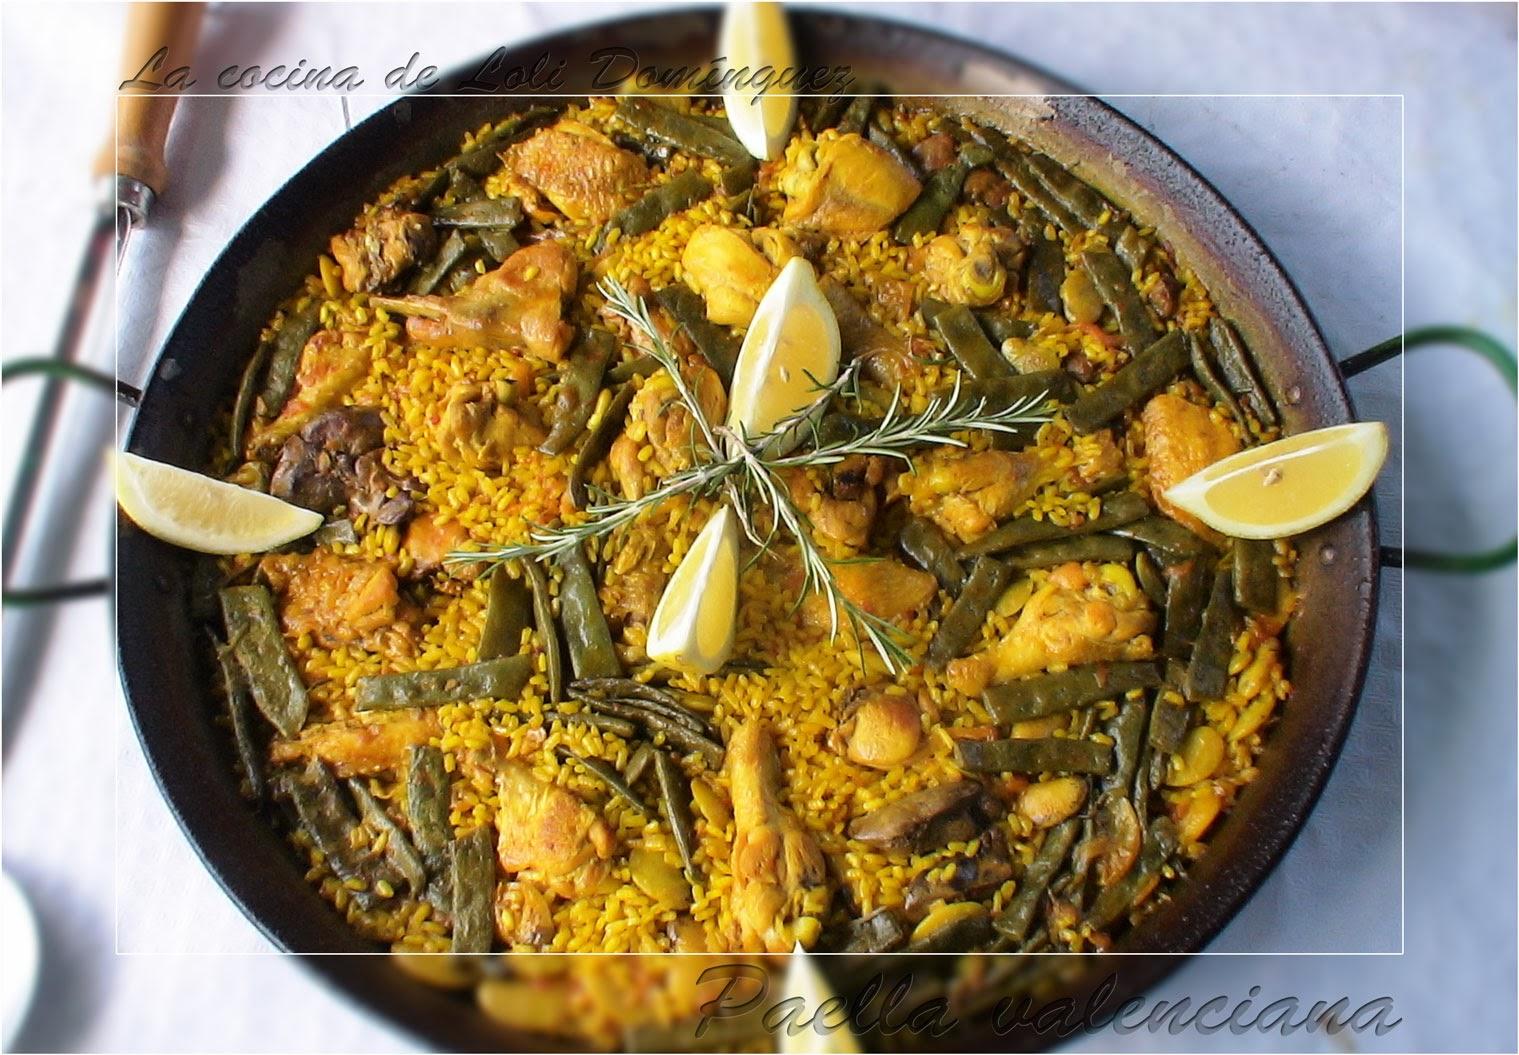 La cocina de loli dom nguez paella valenciana for Cocina valenciana